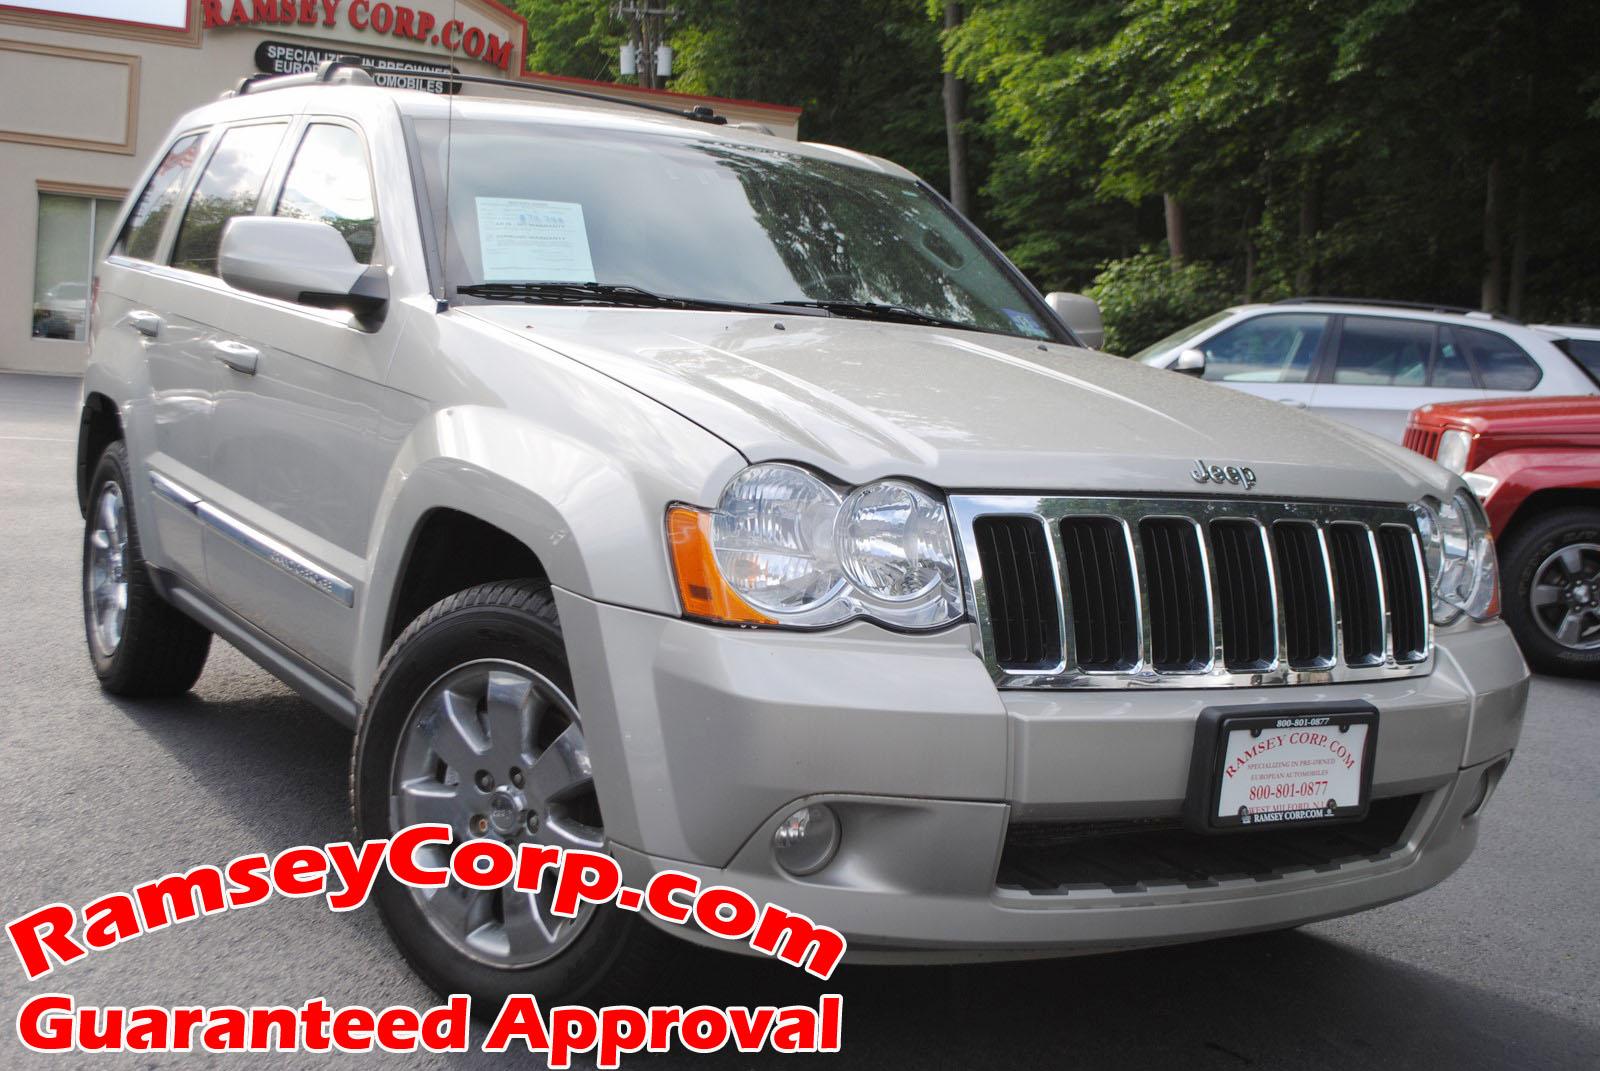 2009 Jeep Grand Cherokee Limited 3.7 SUV